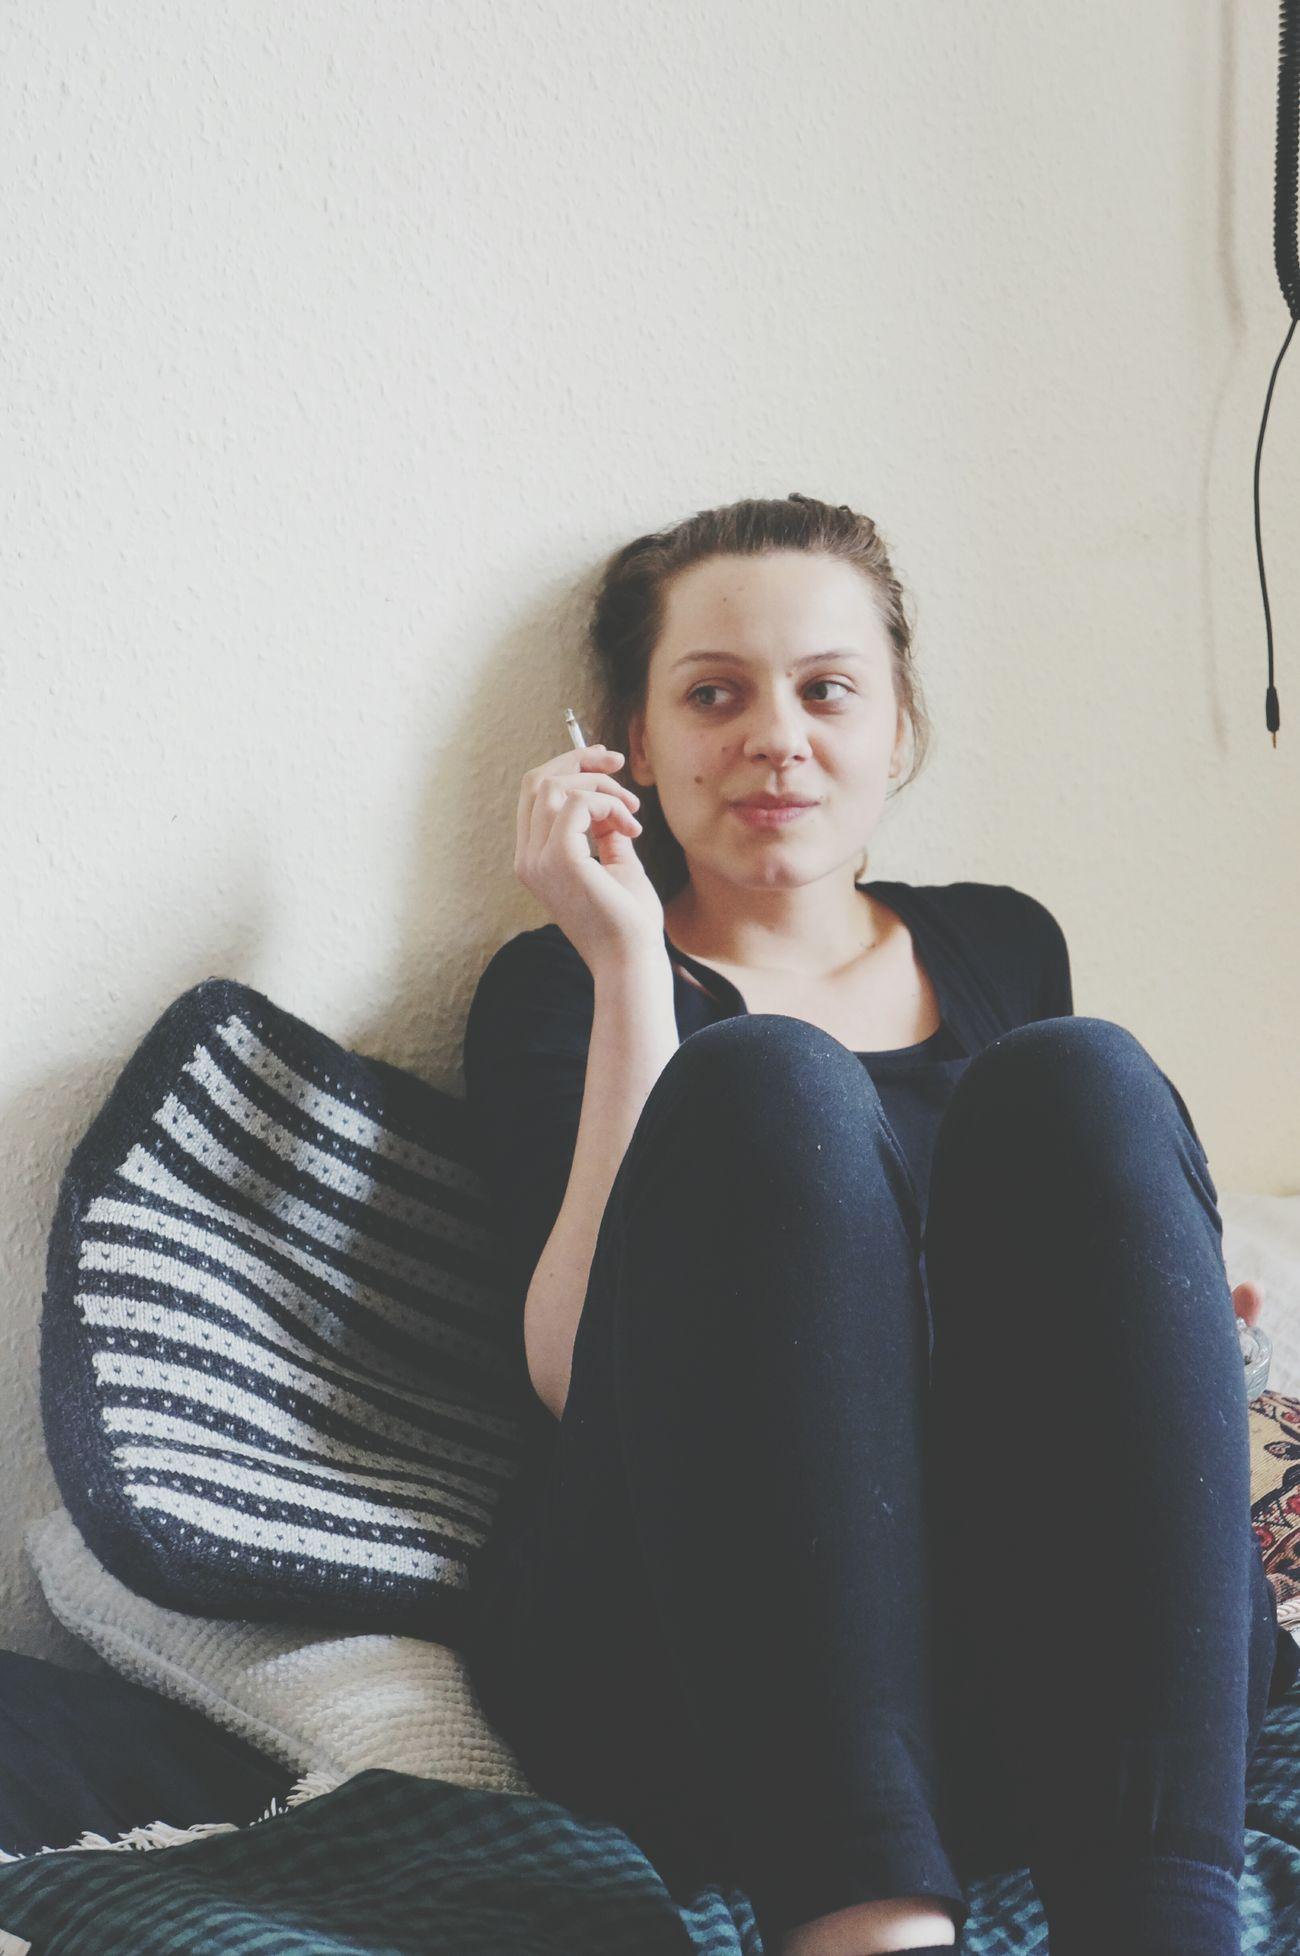 S. Polishbabes Portraitseries Missthisface Photography Portrait Thesekids